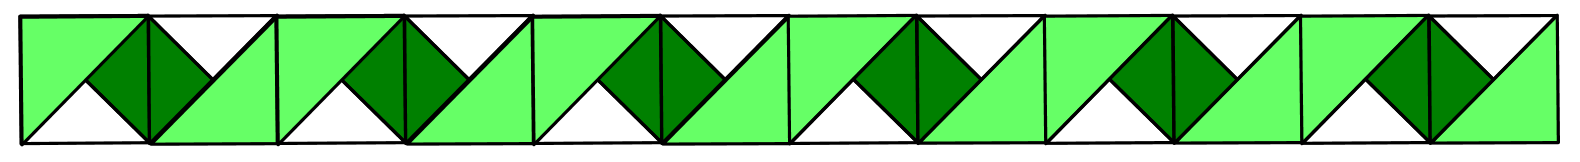 Diagram 9 - Rainbow Ribbons Quilt